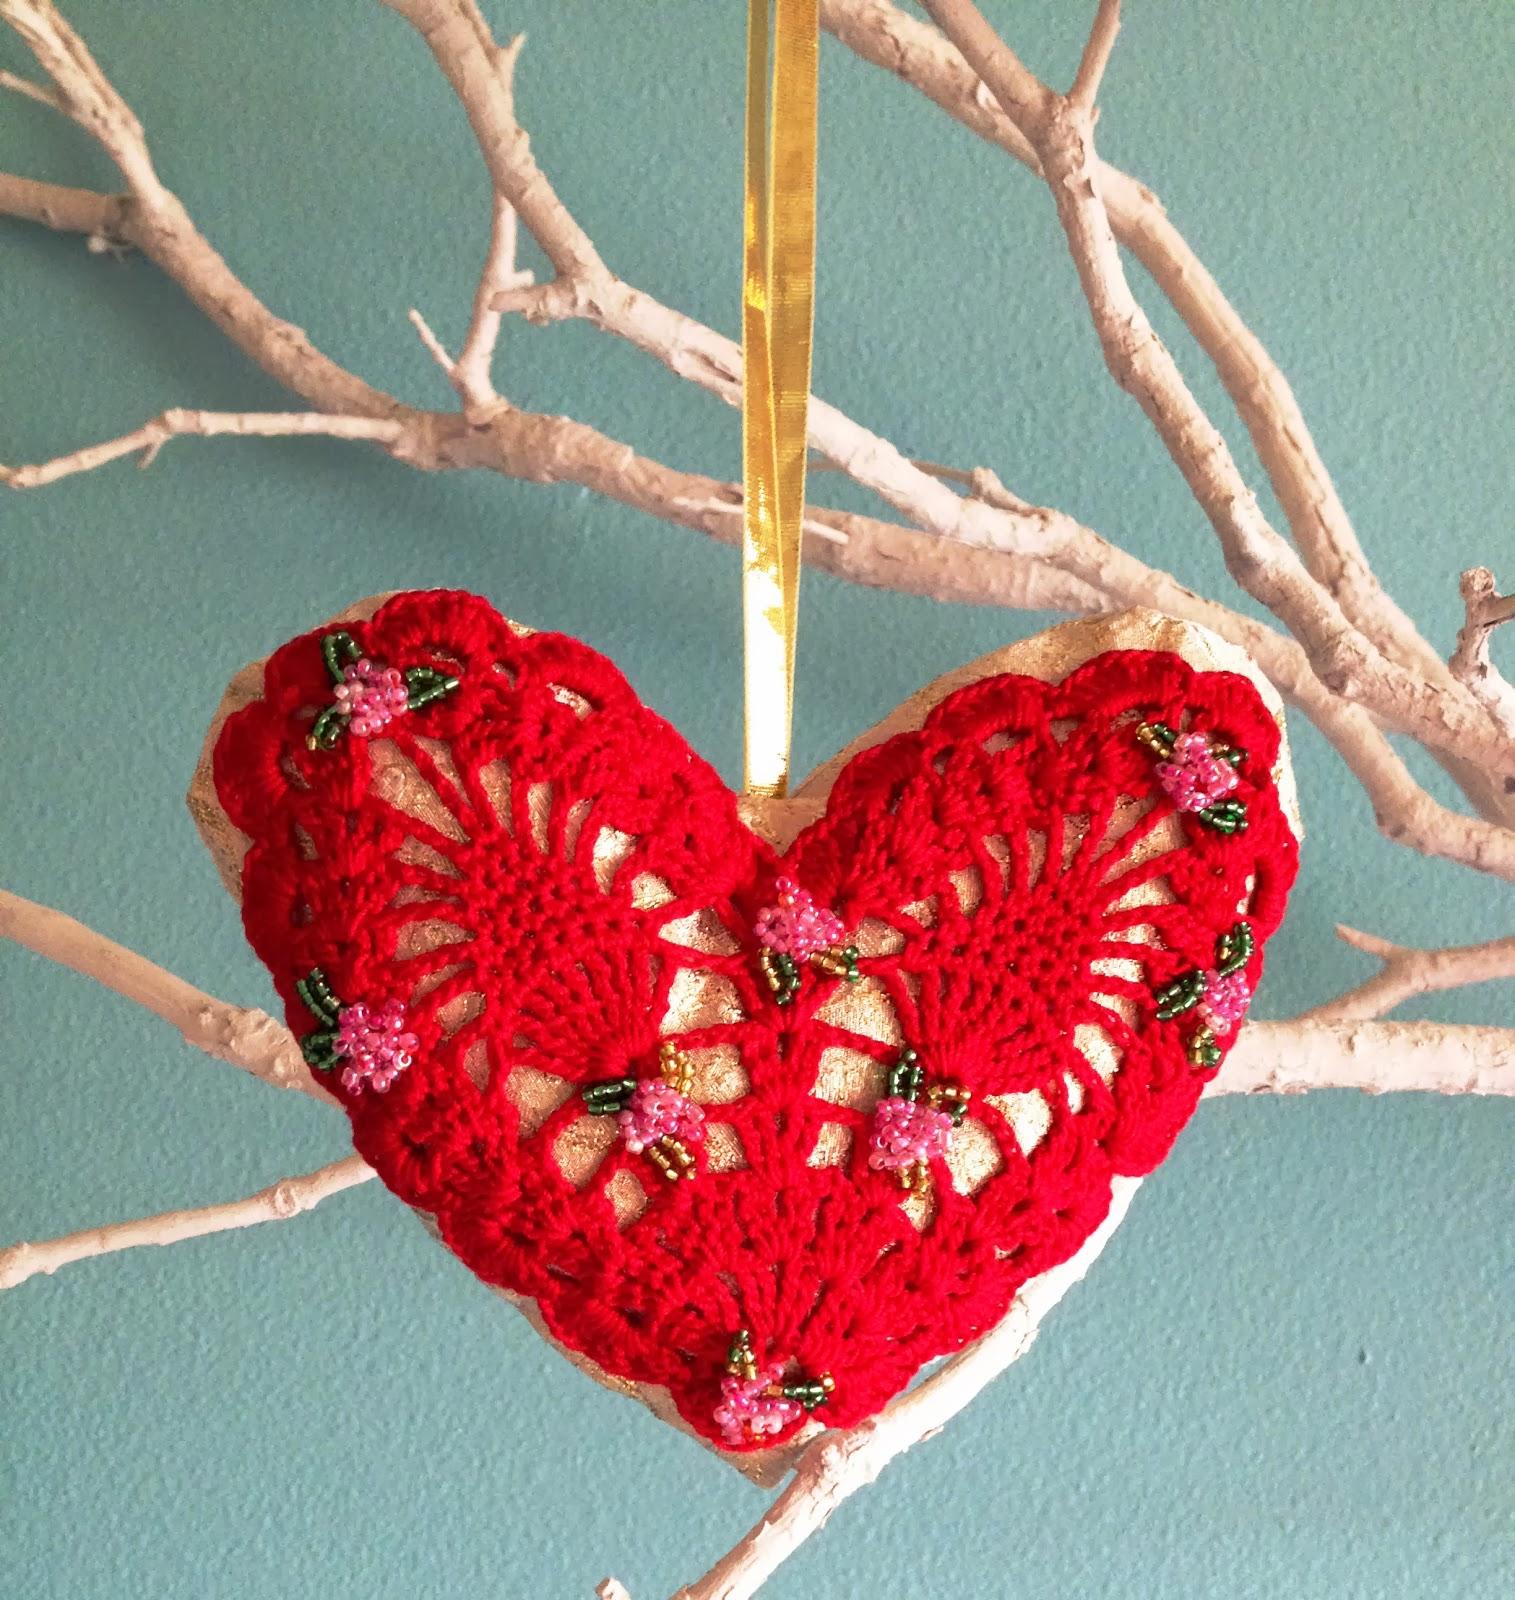 На полученные сердечные подушечки нашила вязаные сердечки.Obtained on valentine heart sewed pillow knitted hearts.